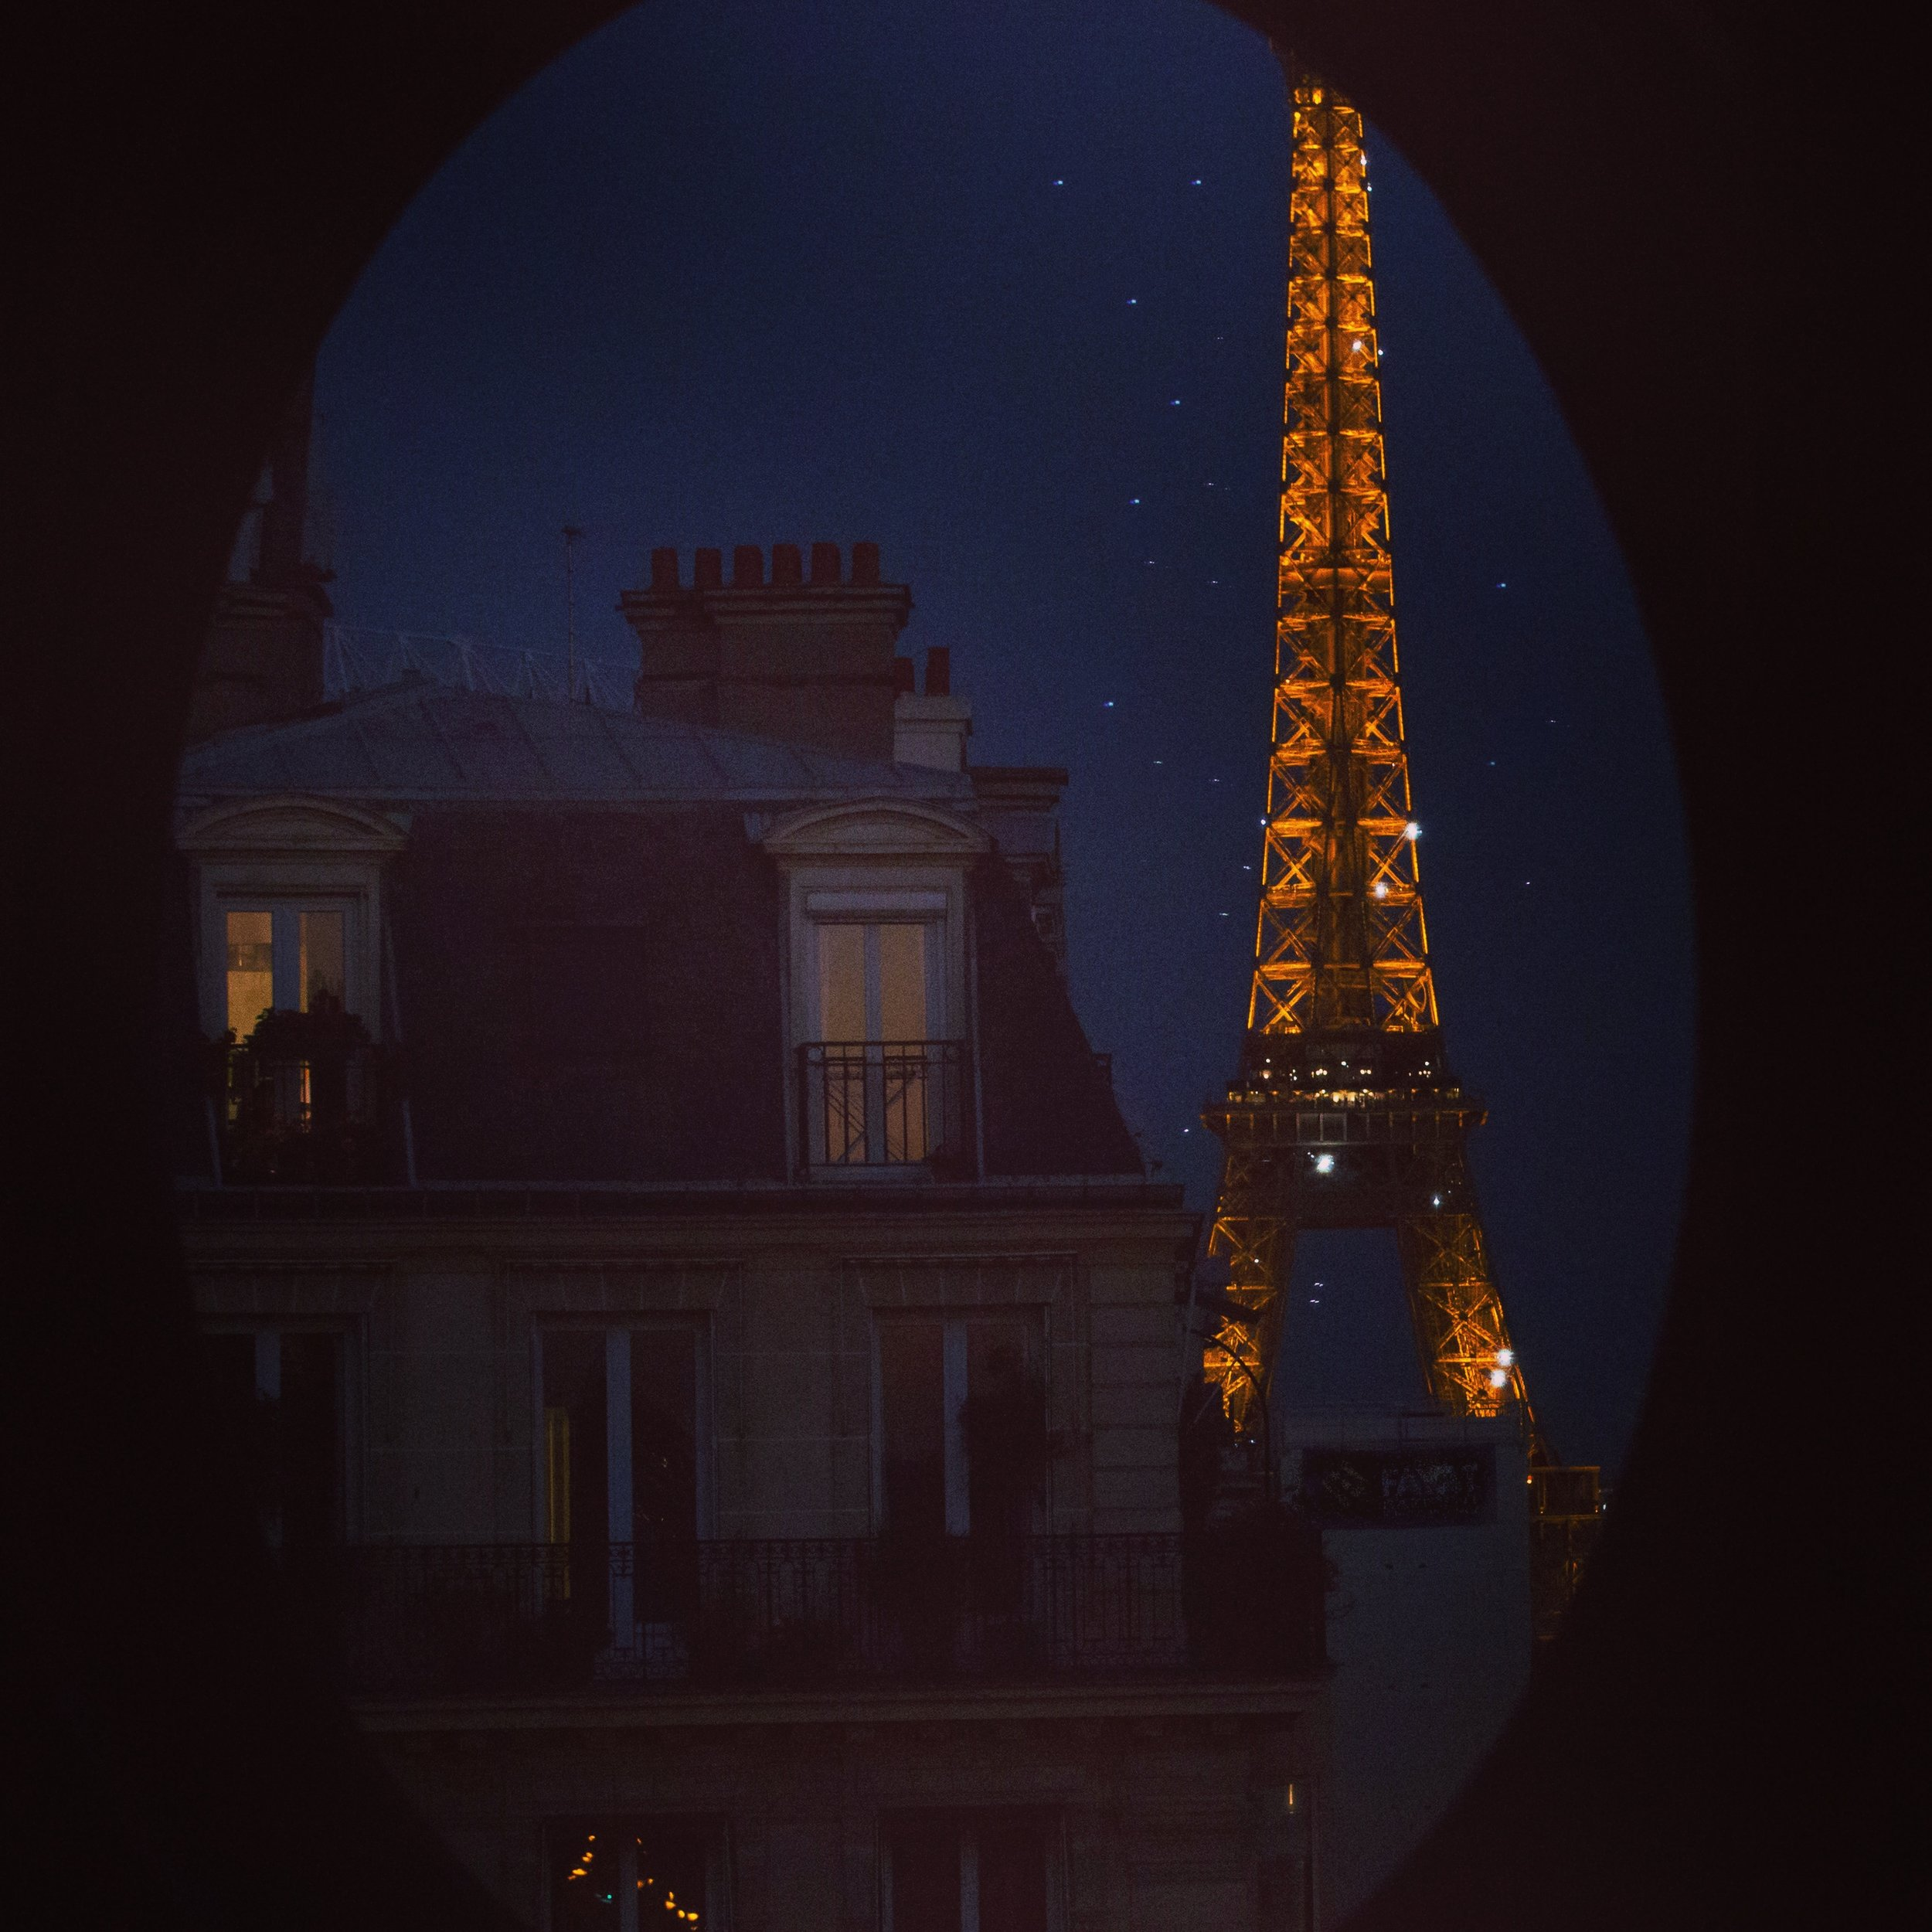 Eiffel Tower by night, Paris